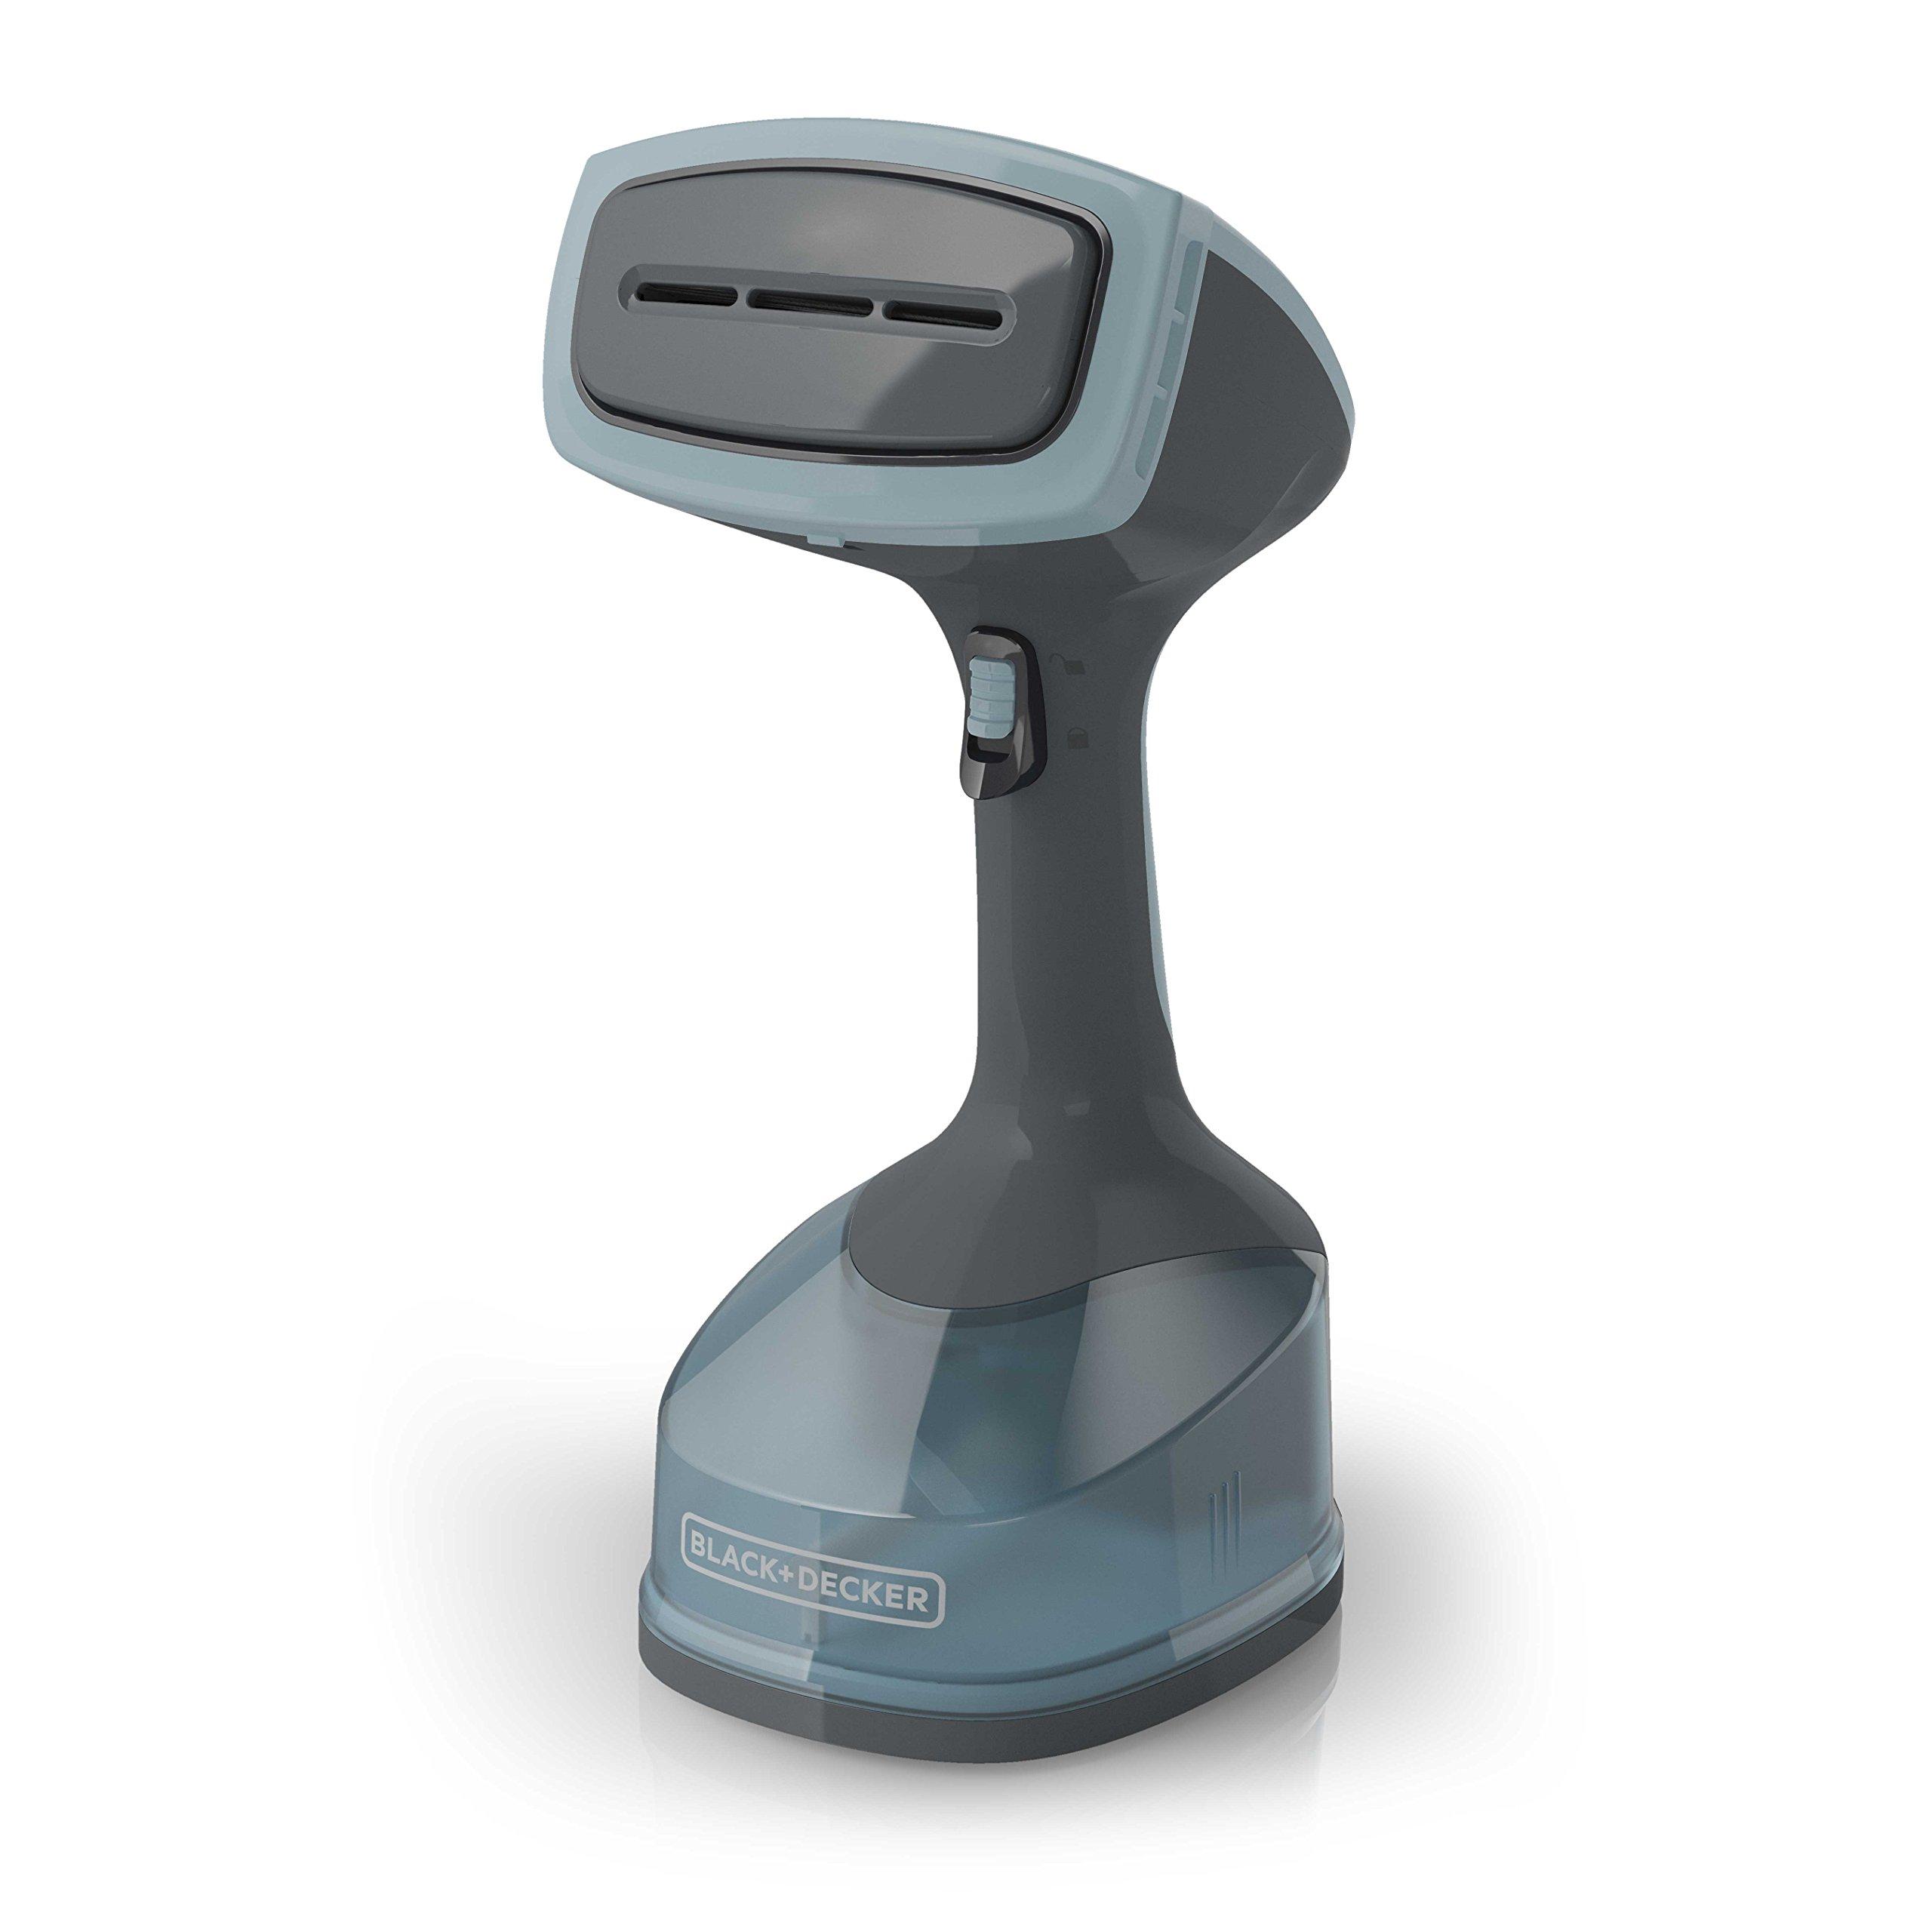 BLACK+DECKER Advanced Handheld Garment/Fabric Steamer with 3 Attachments, Gray/Blue, HGS200